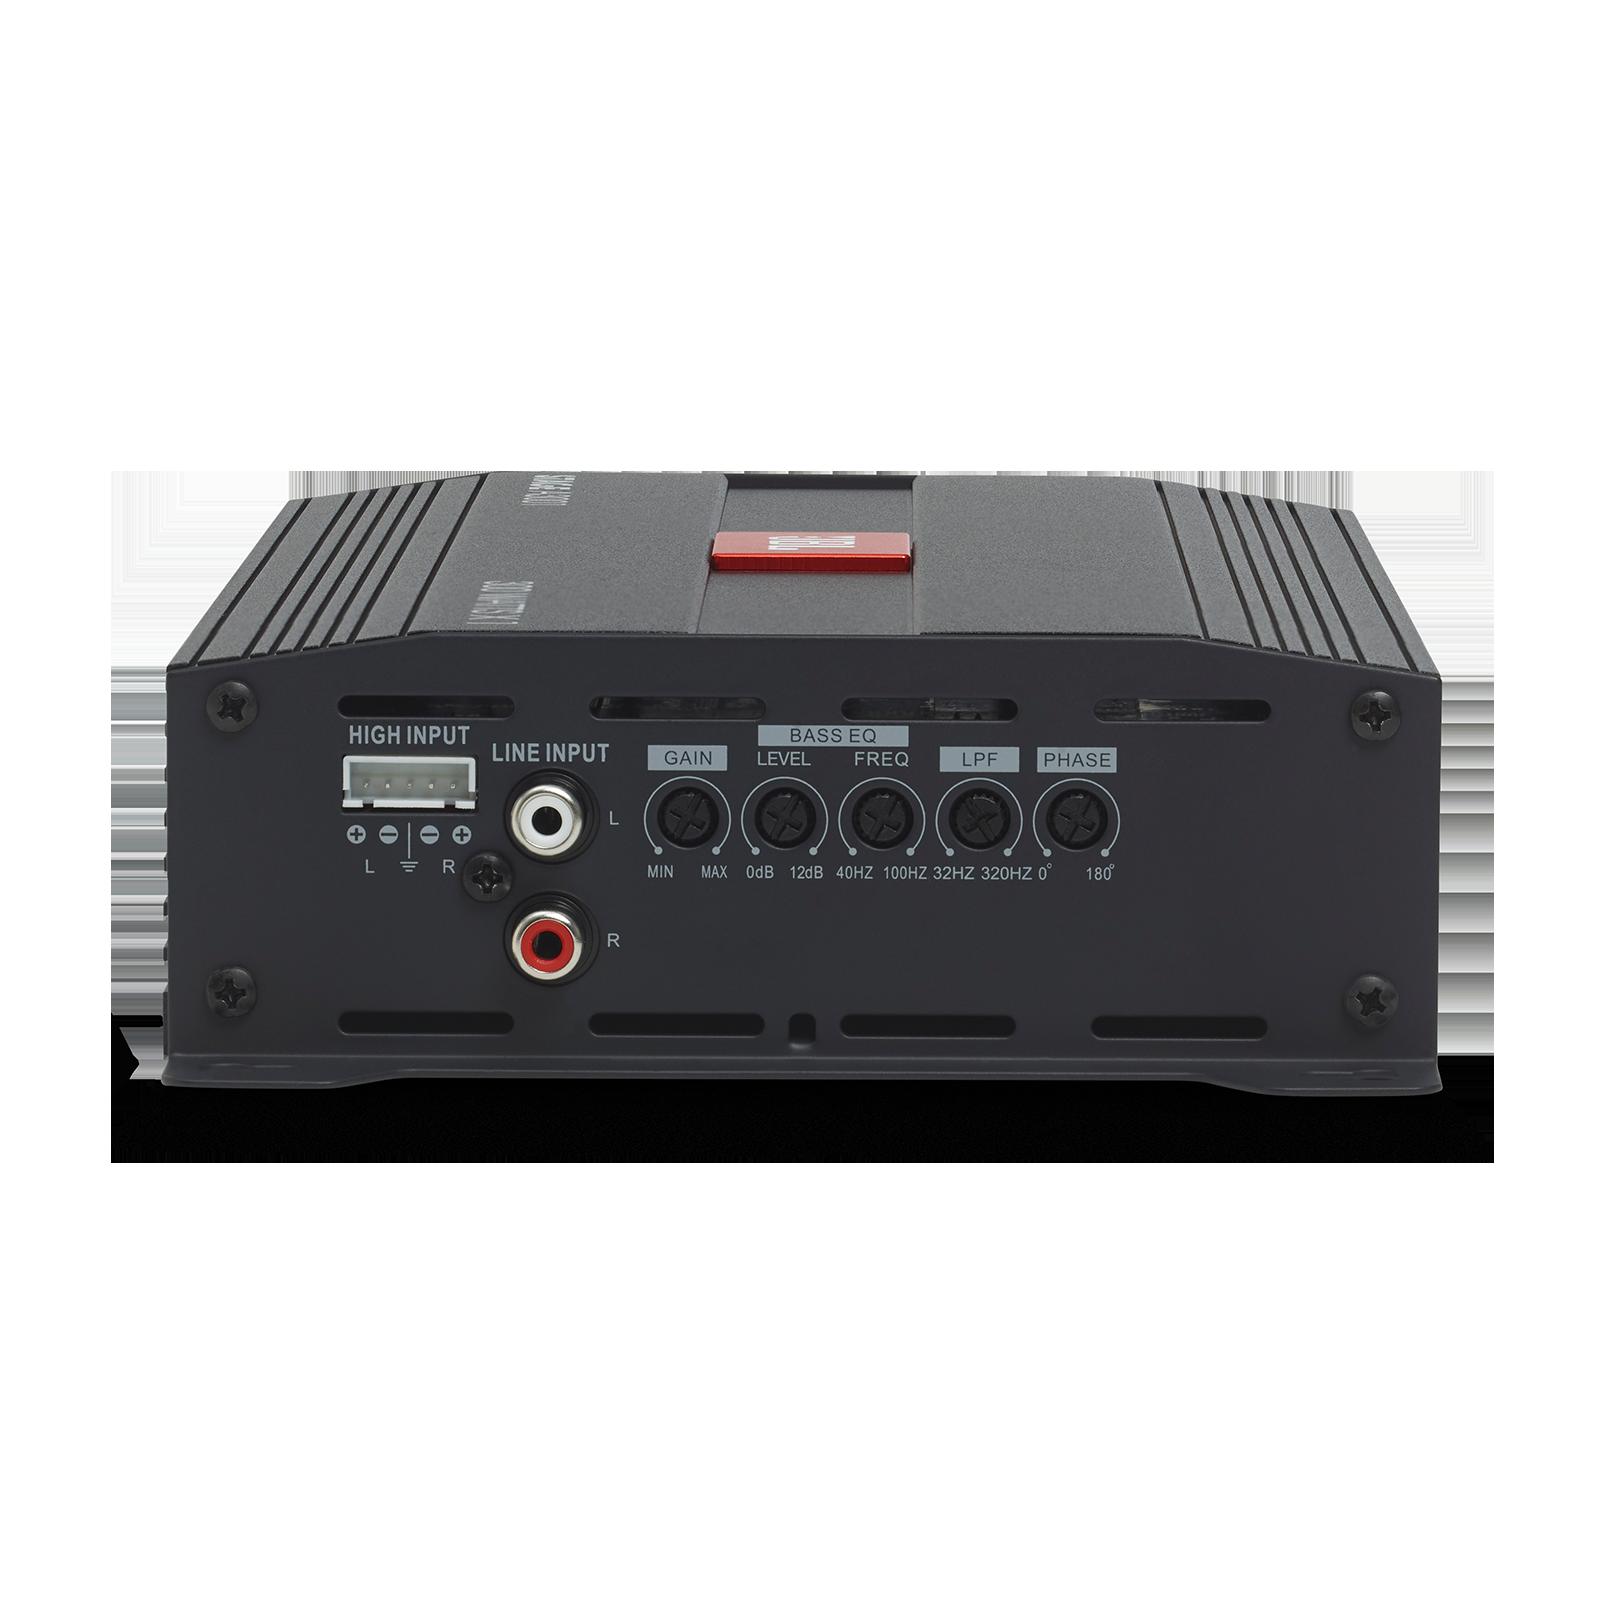 JBL Stage Amplifier A3001 - Black - Class D Car Audio Amplifier - Back